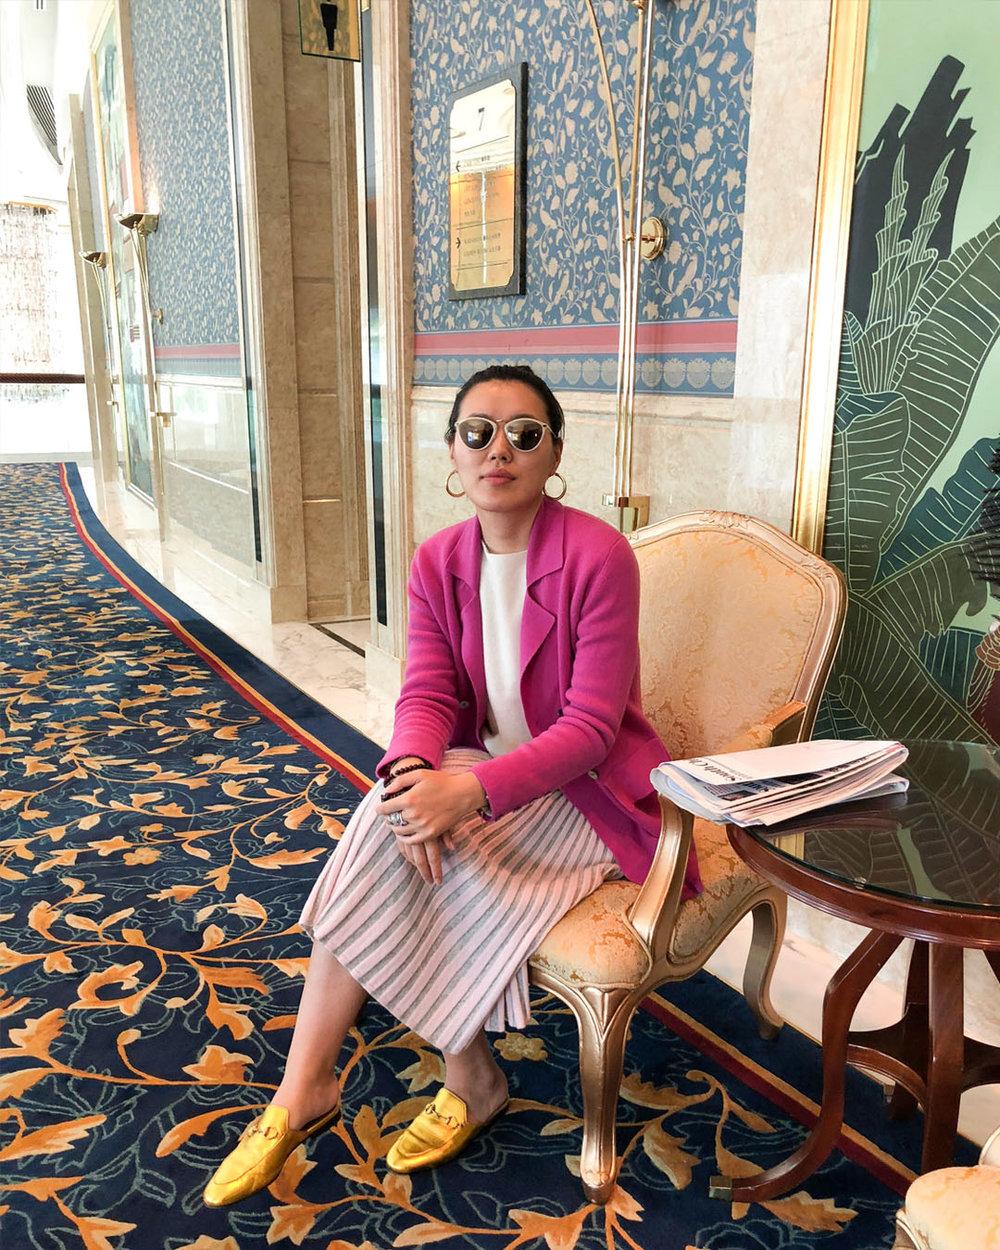 Mandkhai wearing SS18 blazer and SS17 skirt